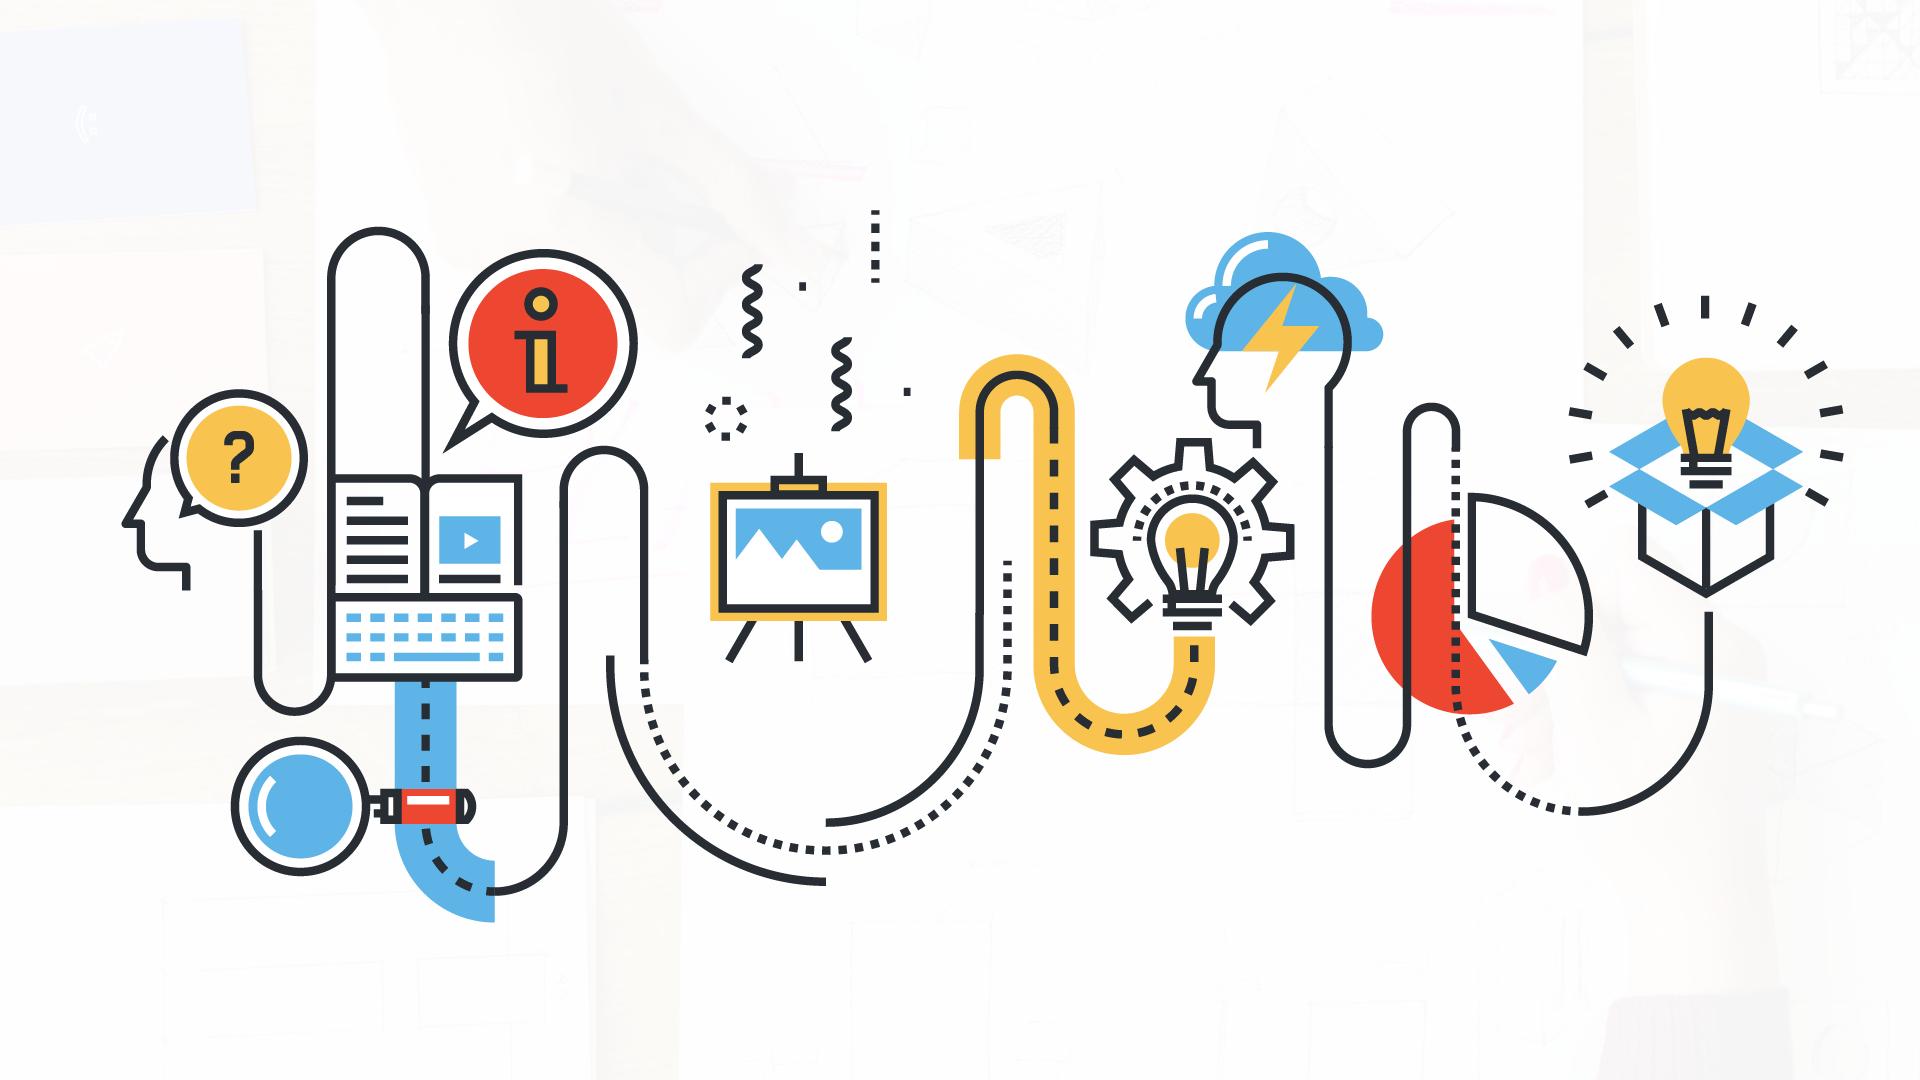 3 Tips for Designing Blended Learning - Tim Slade eLearning Blog